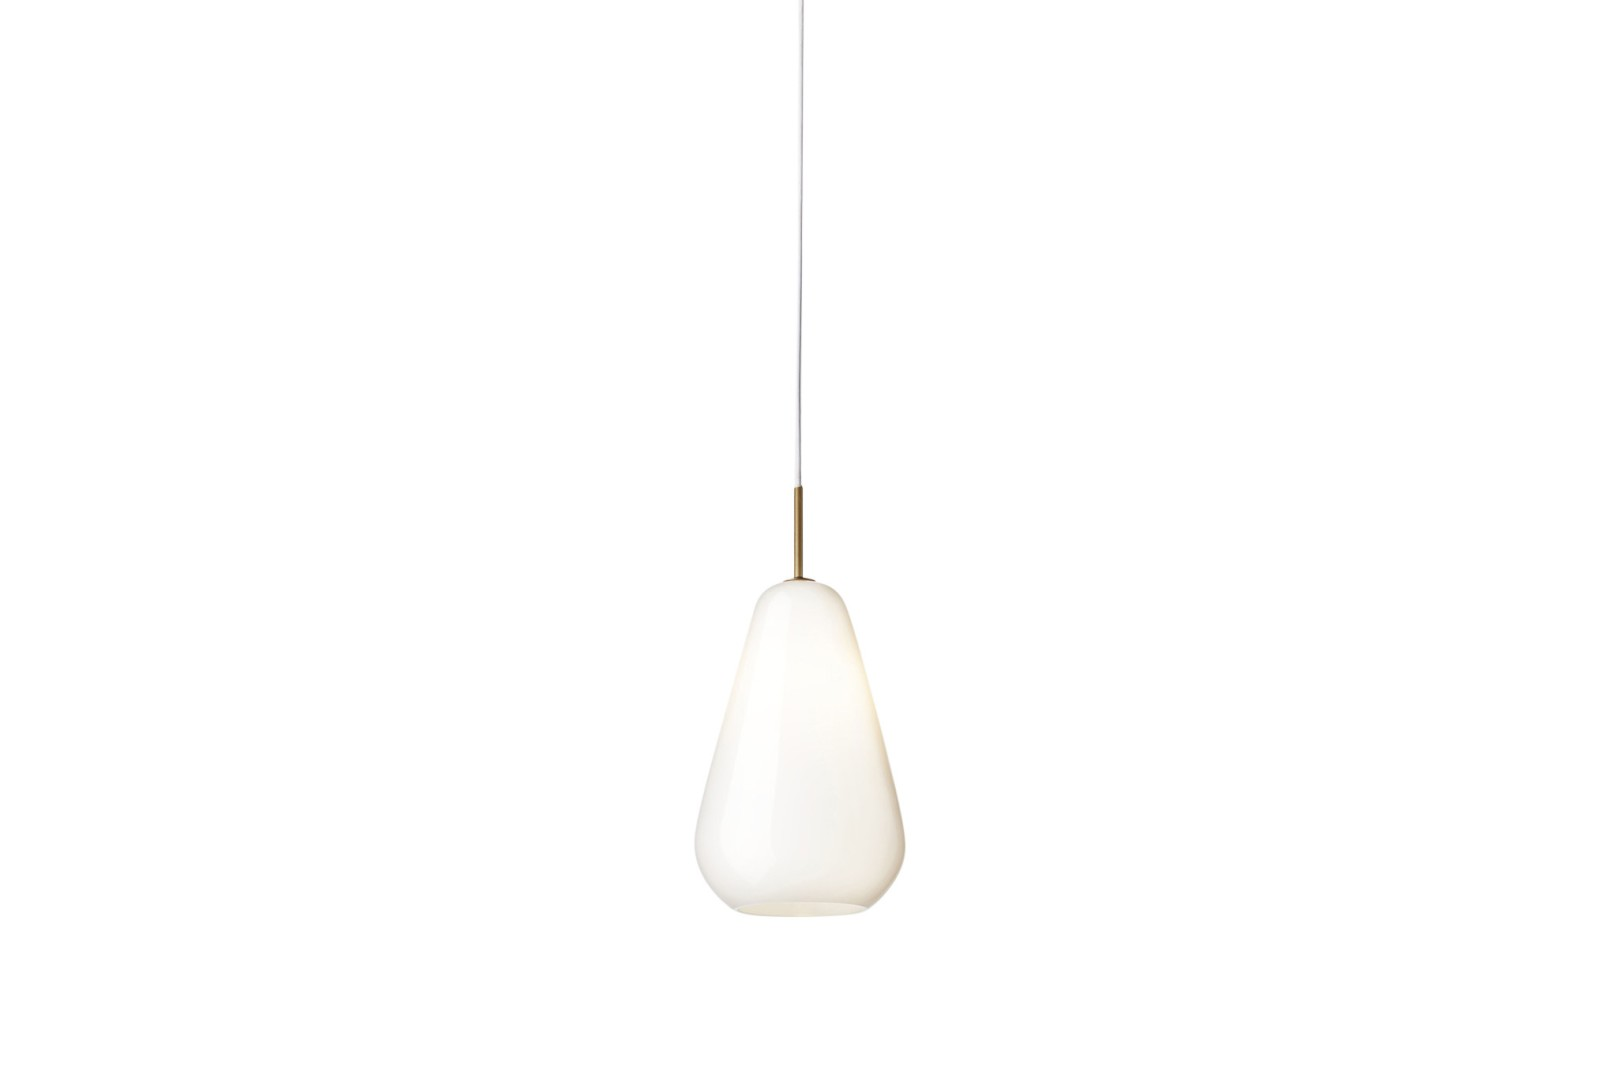 Anoli 1 Medium Light Nordic Gold/Opal White